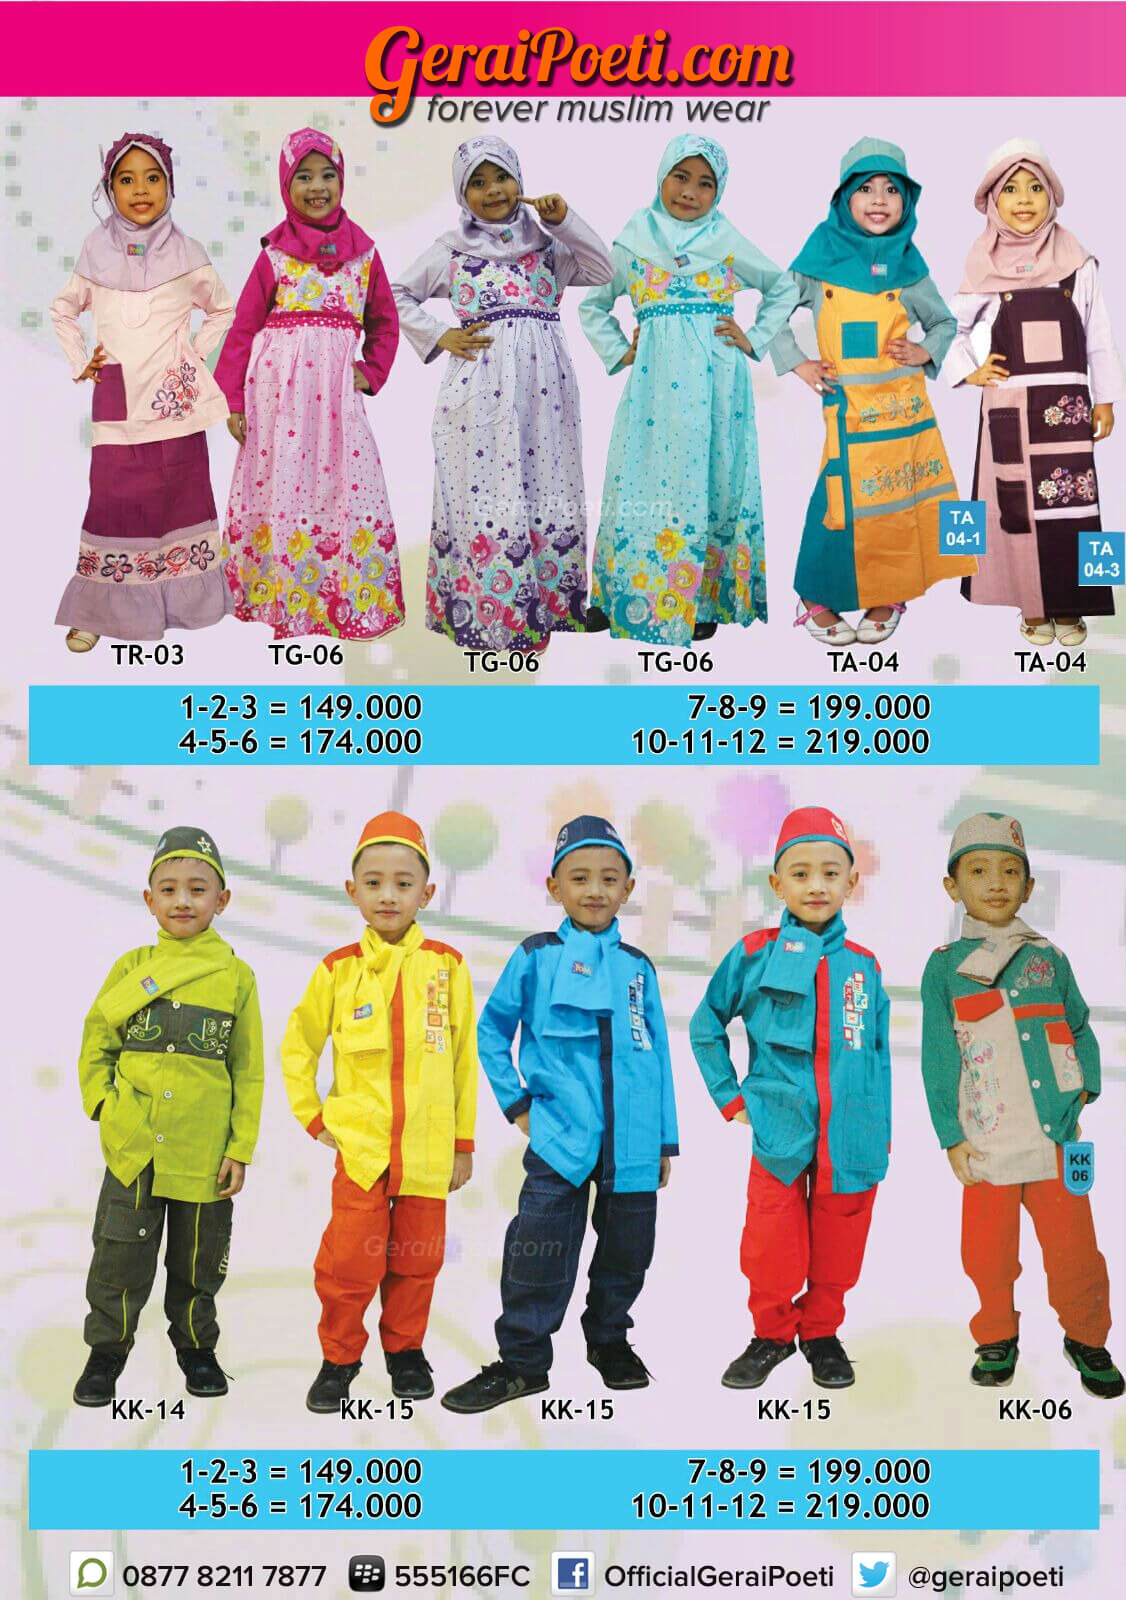 Katalog Baju Muslim Anak dan Dewasa GeraiPoeti Collection 2016 page 3